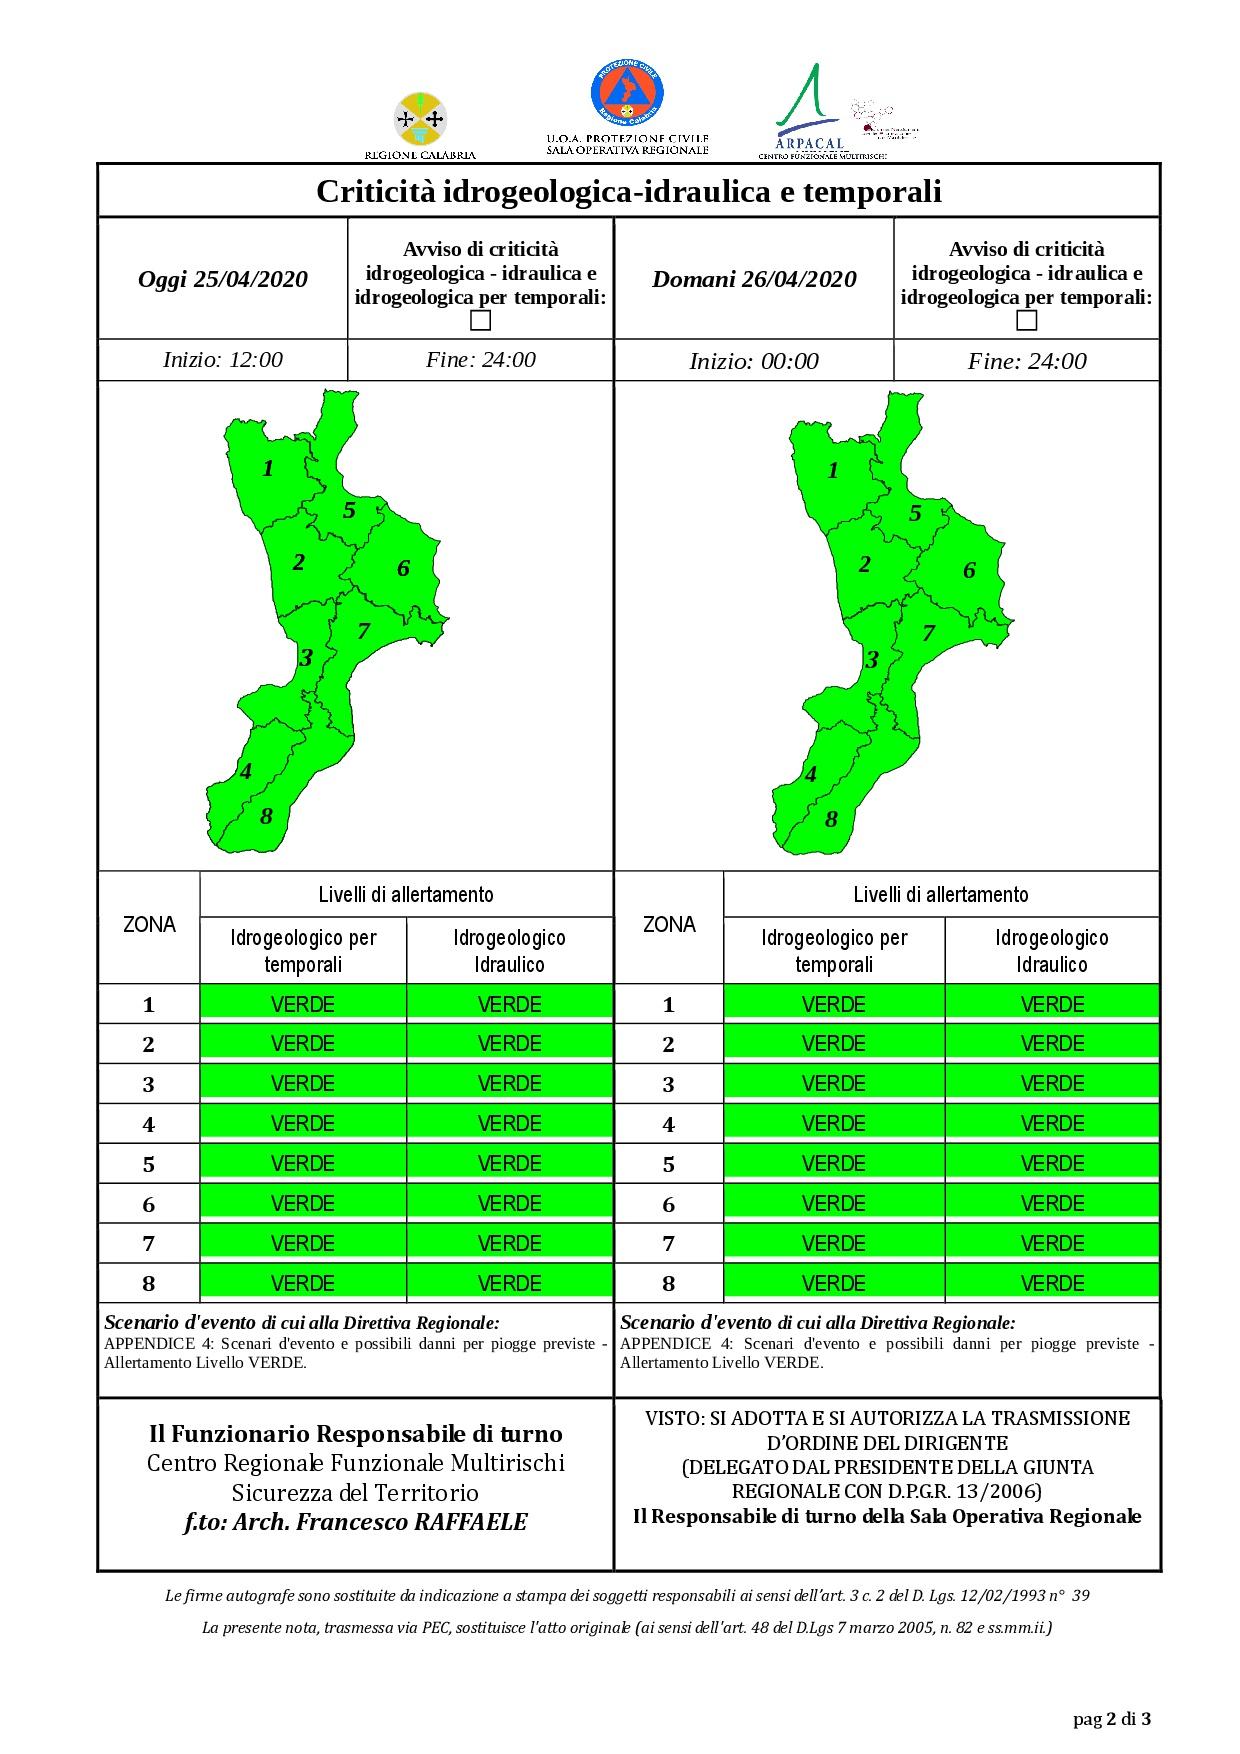 Criticità idrogeologica-idraulica e temporali in Calabria 25-04-2020